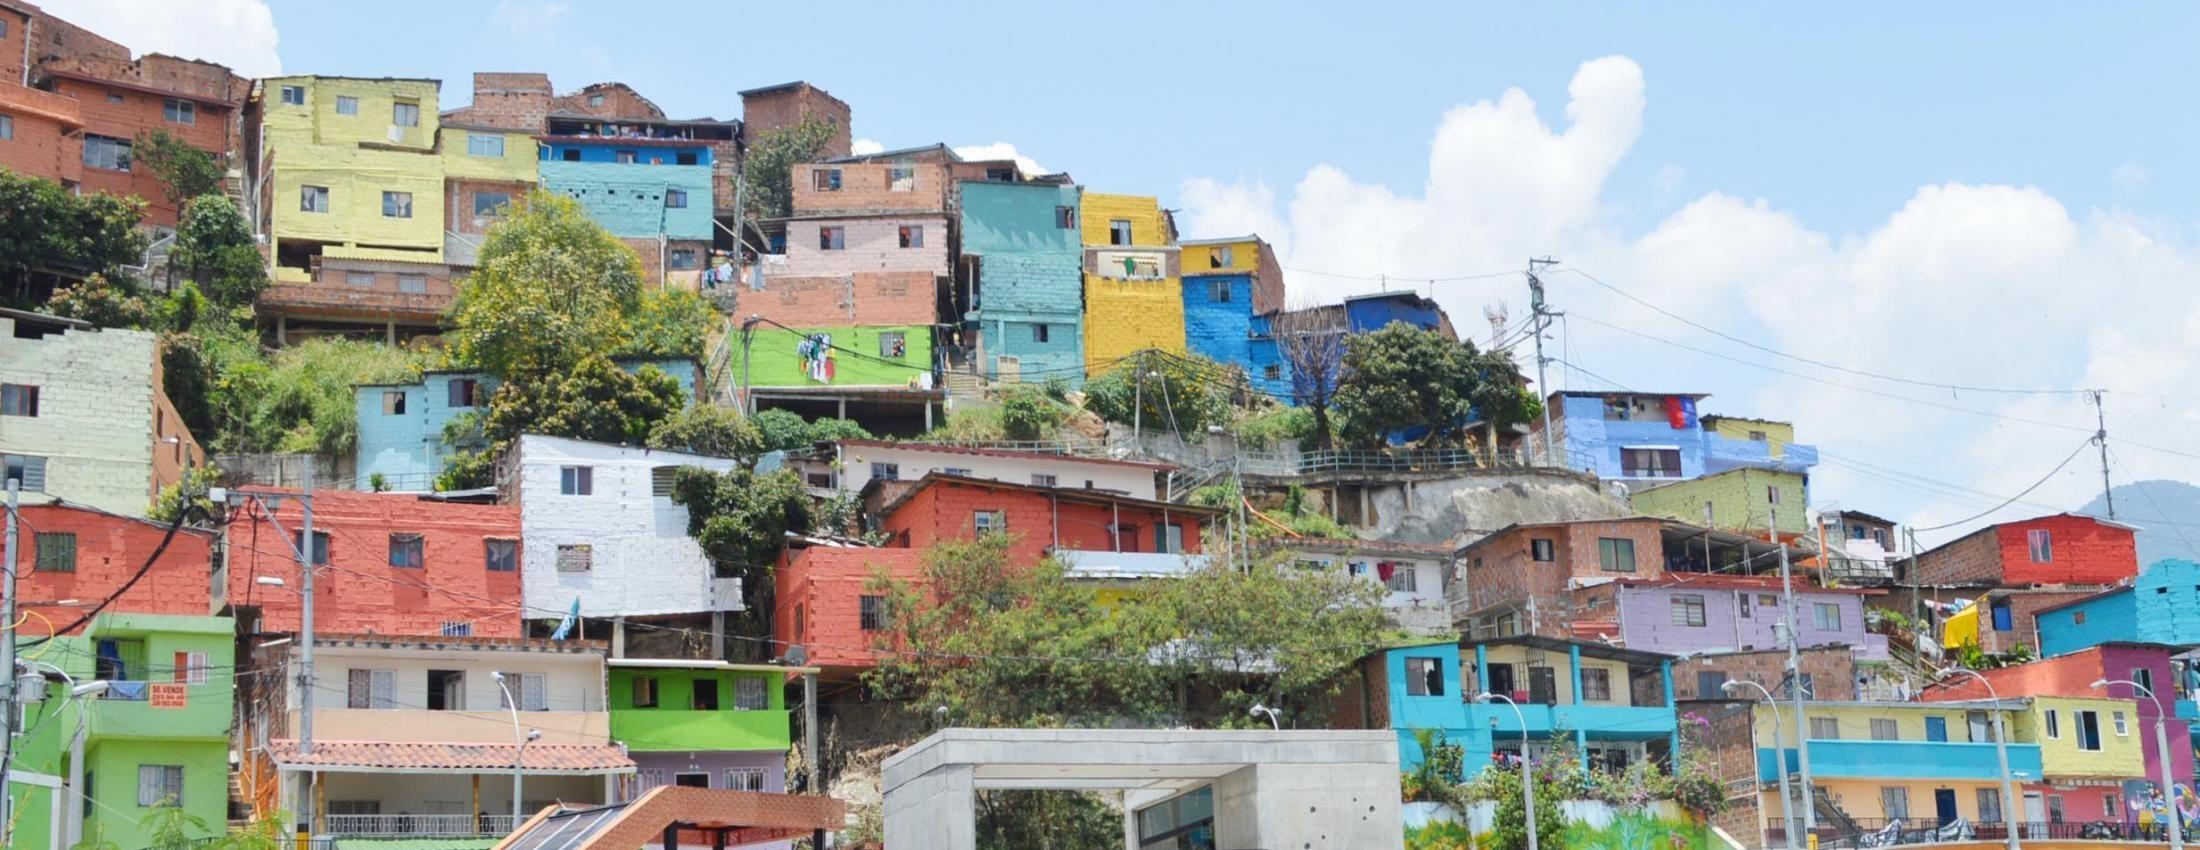 UN-Habitat (United Nations Human Settlements Programme